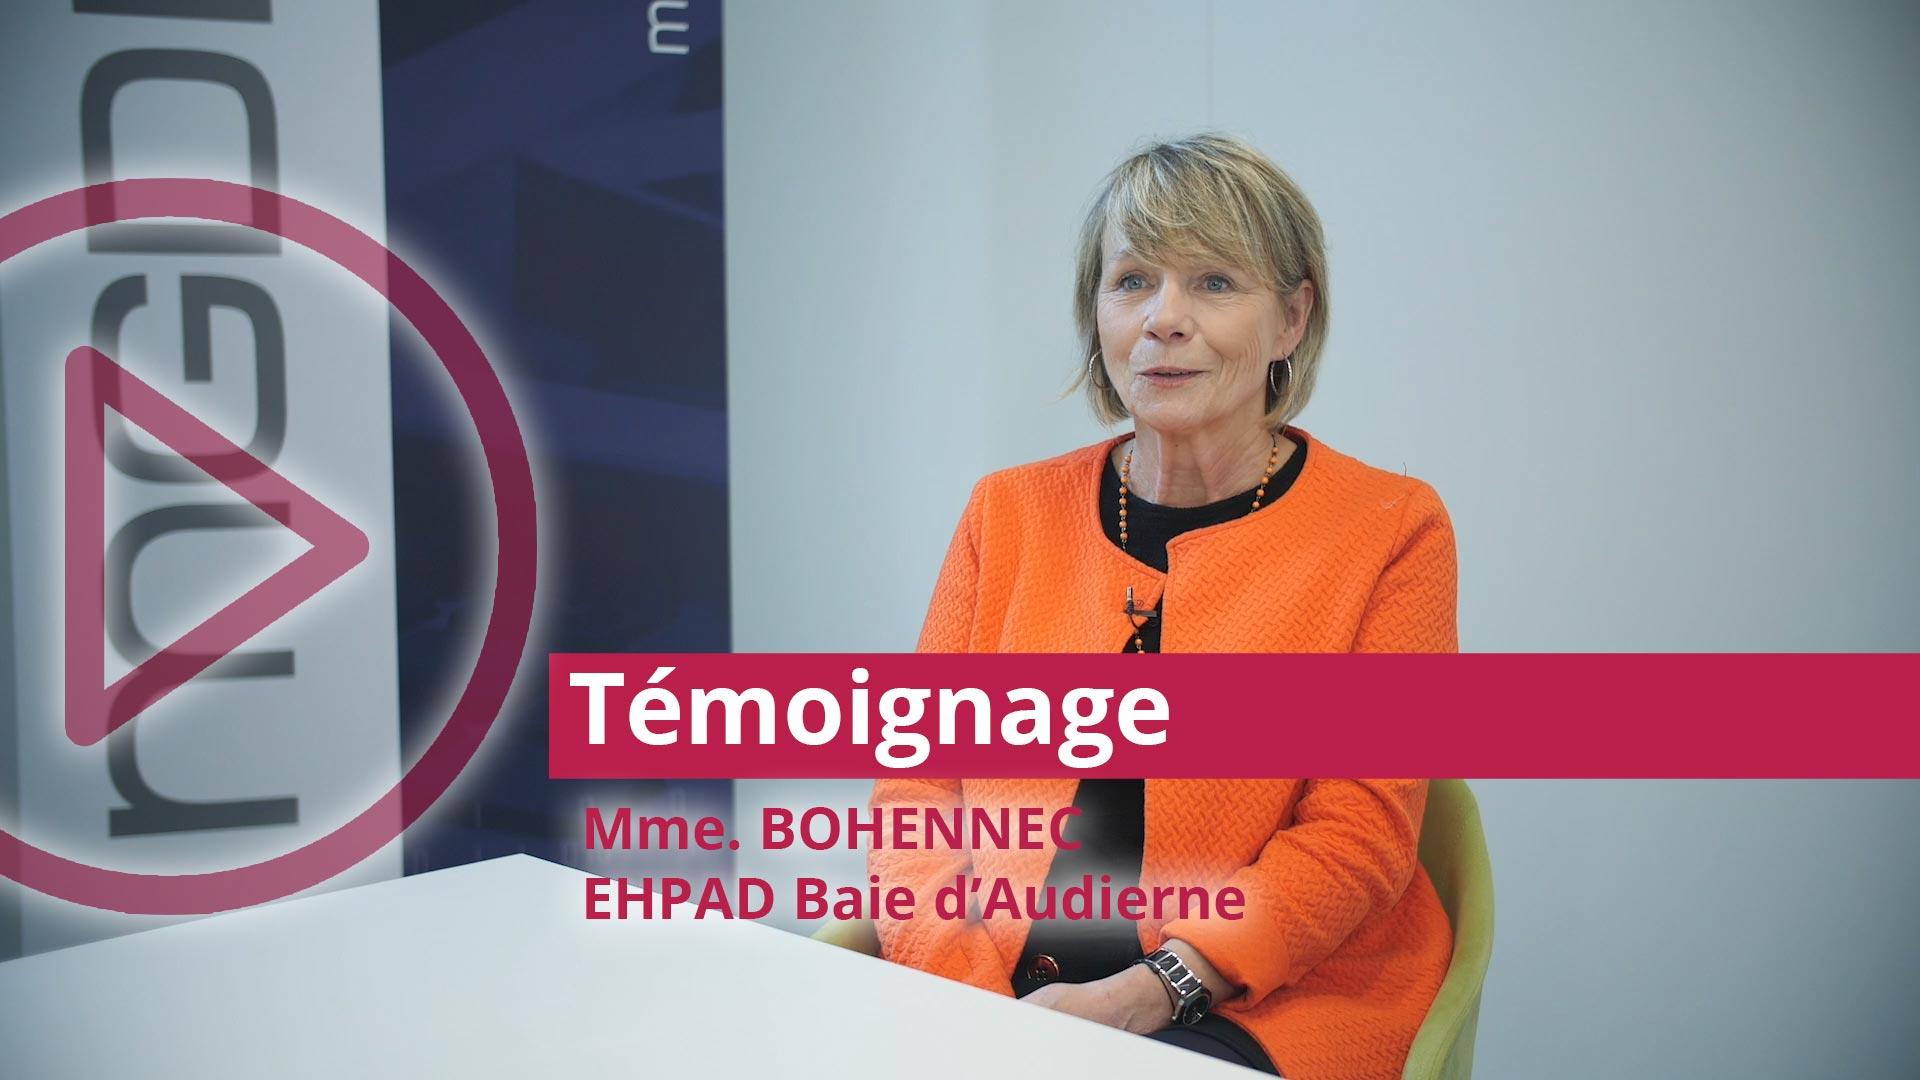 MGDIS-sante-temoignage-Mme-Bohennec-EHPAD-Baie-D-Audierne